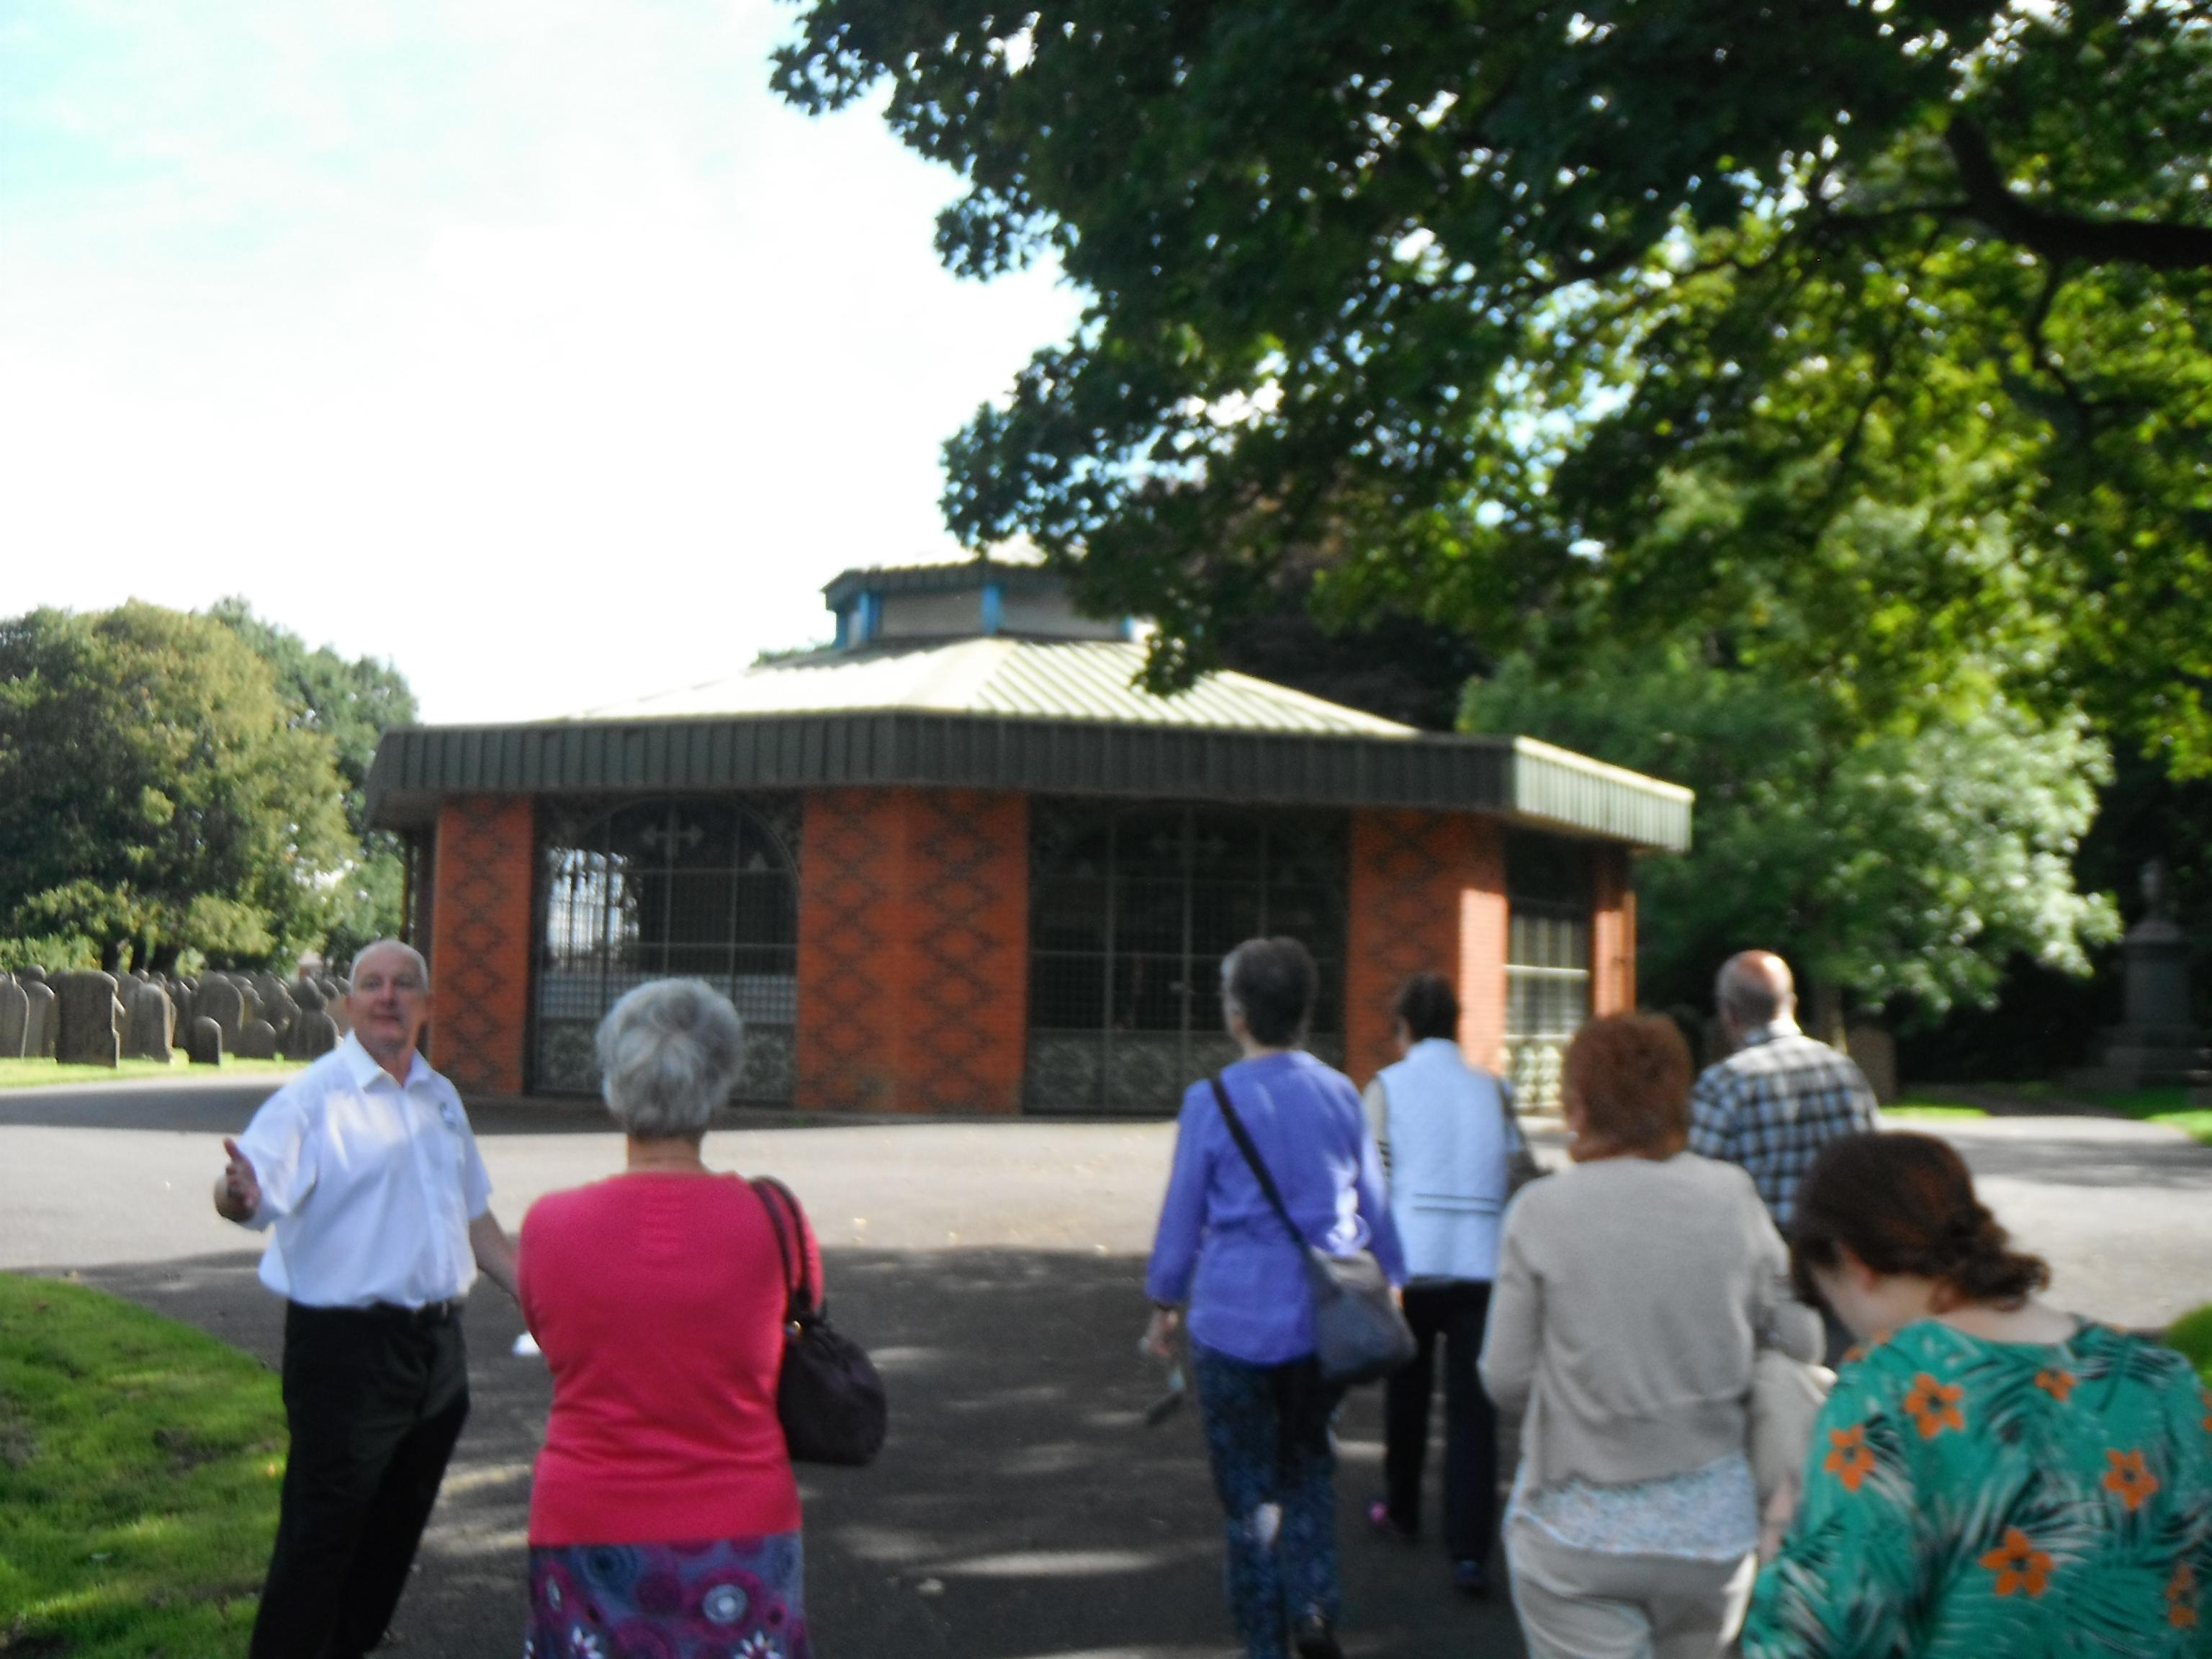 Photo taken by me - Muslim prayer house, Preston cemetary